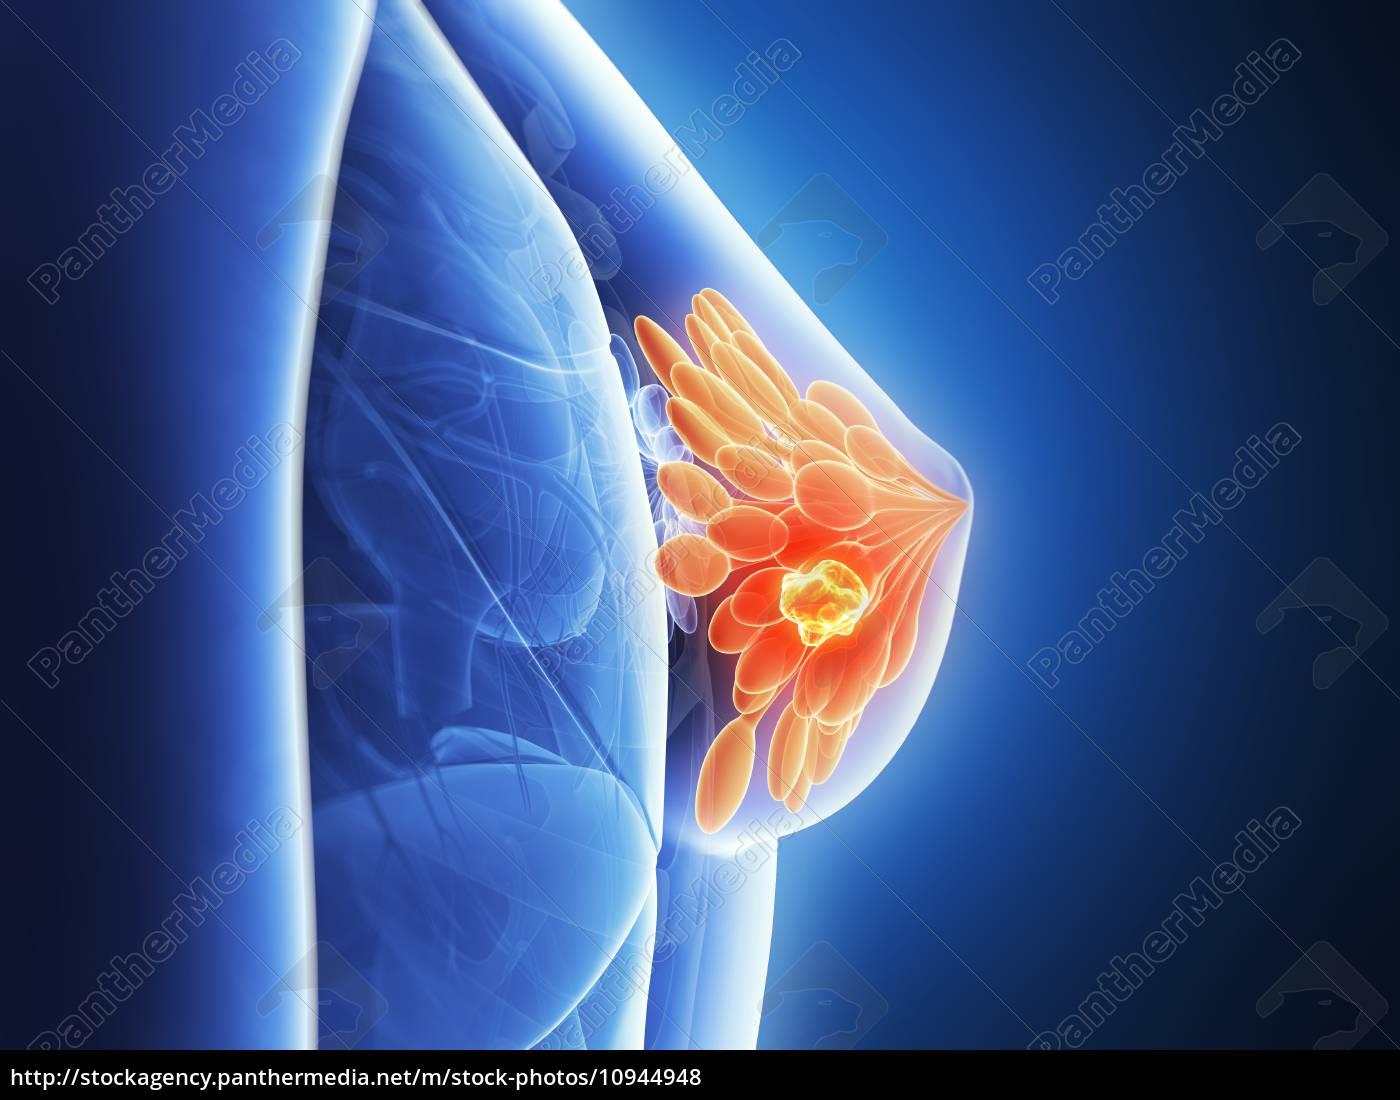 3d, gemachte, illustration-brustkrebs - 10944948